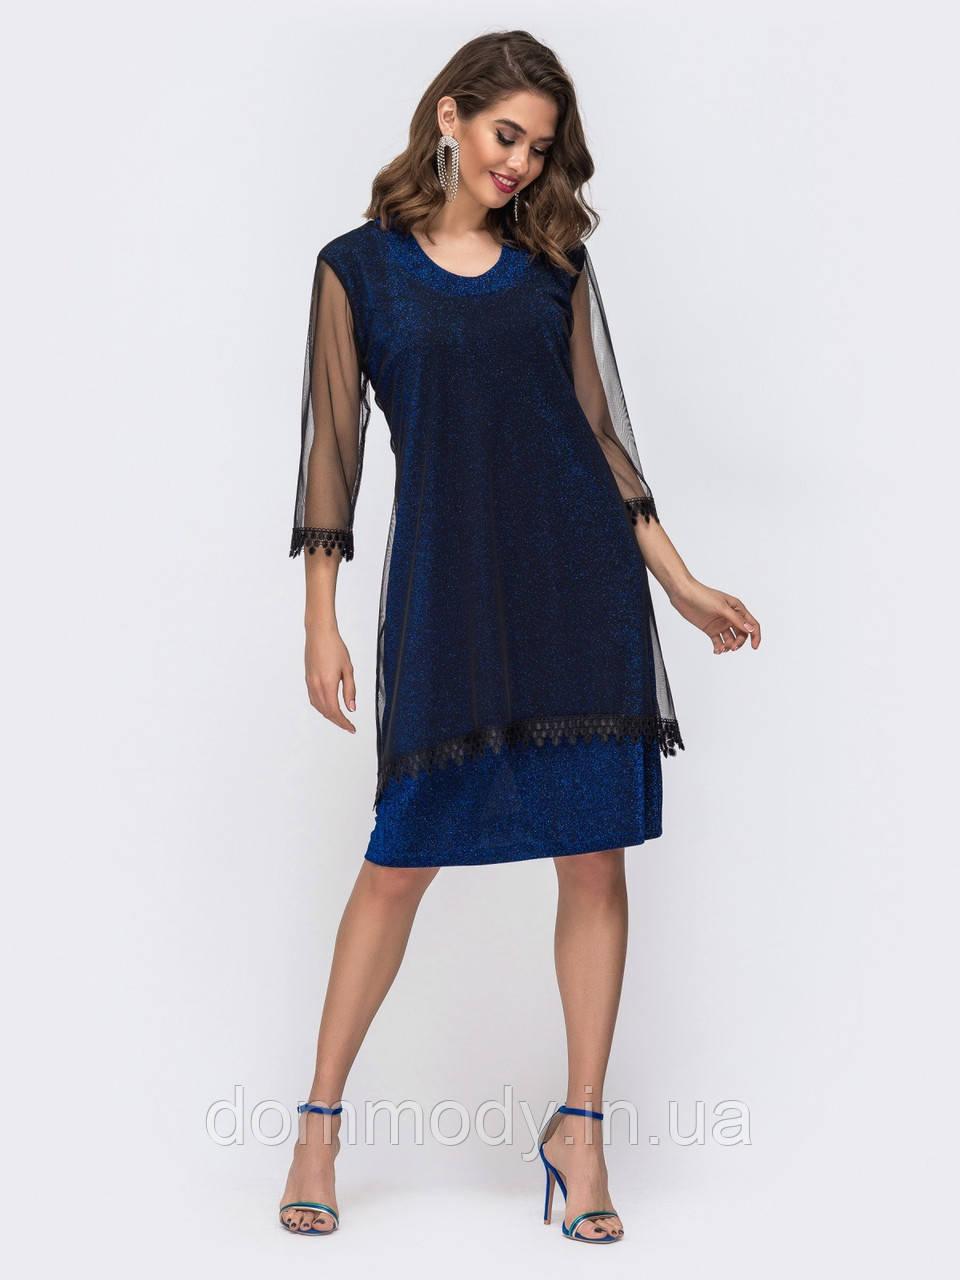 Сукня жіноча Candice electrician